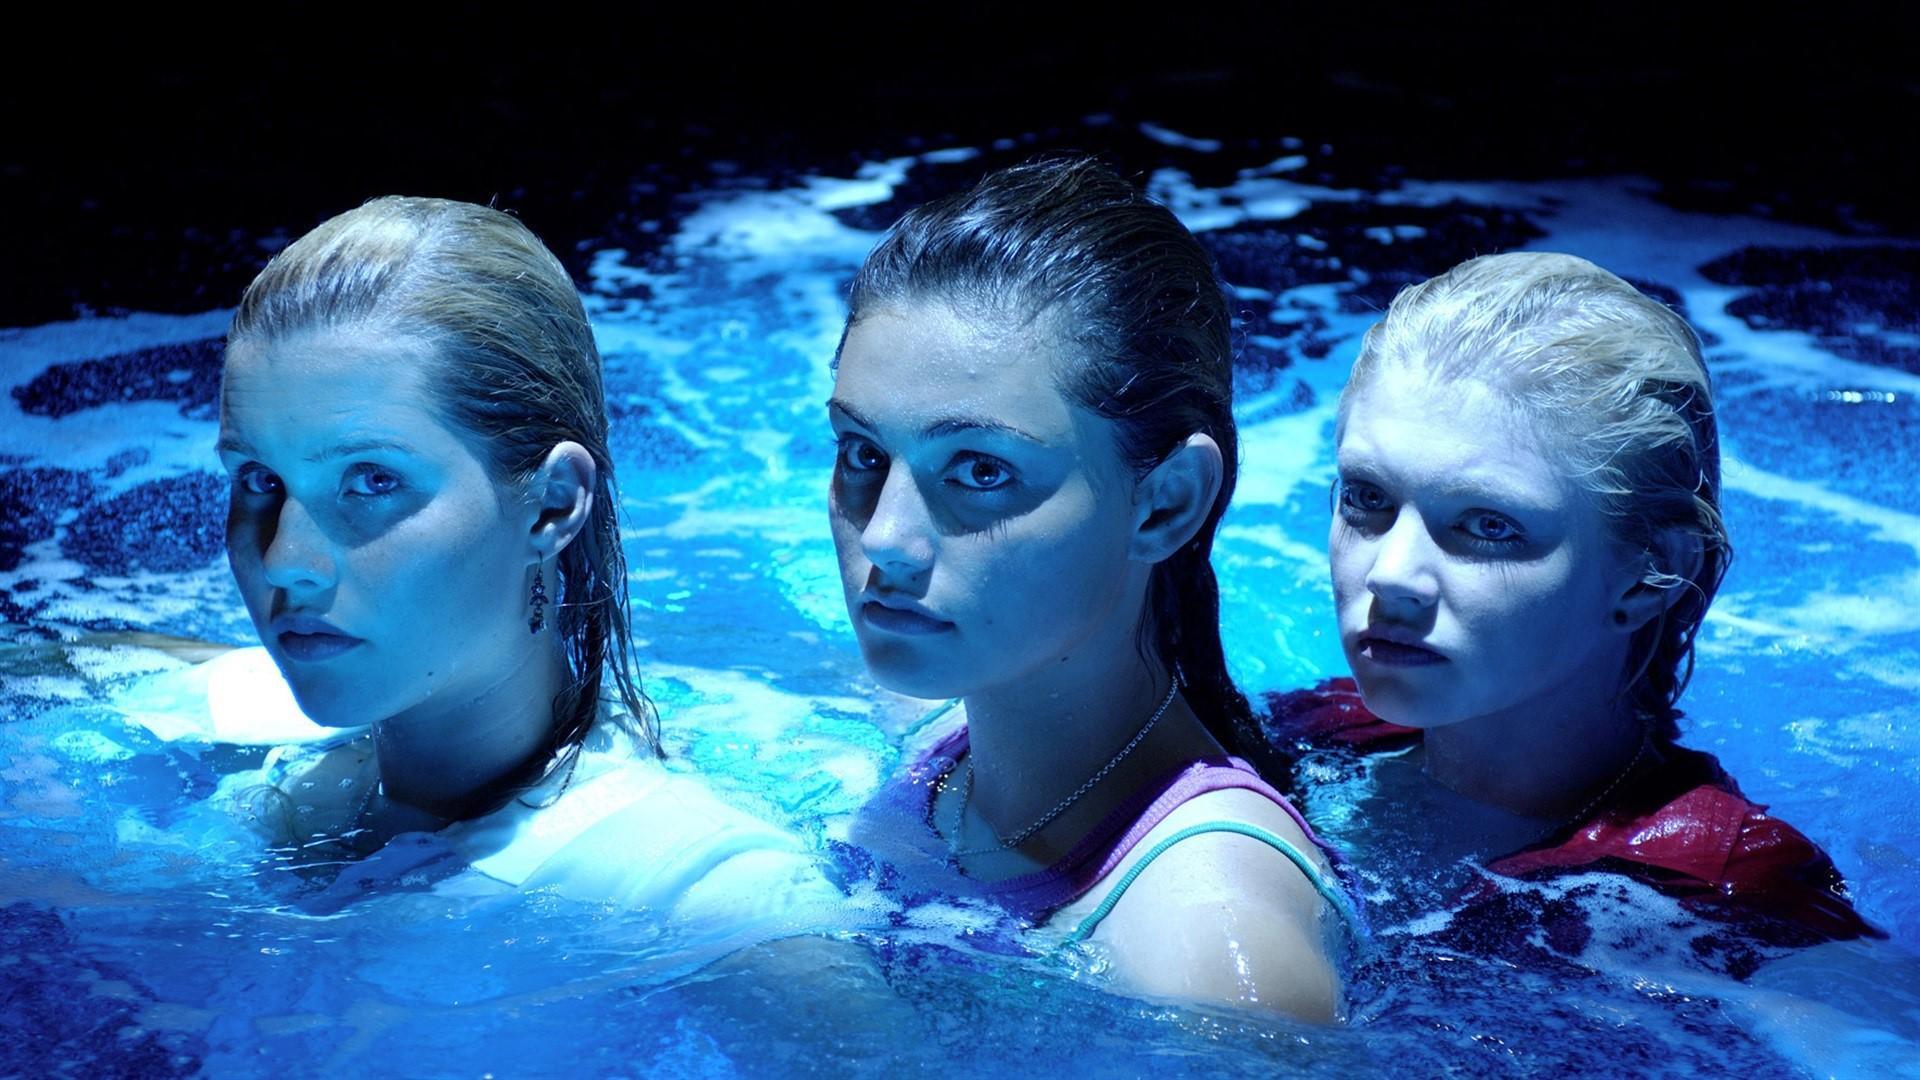 Kika - Folgenübersicht H2O - Plötzlich Meerjungfrau bestimmt für H2O Plötzlich Meerjungfrau Ausmalbilder